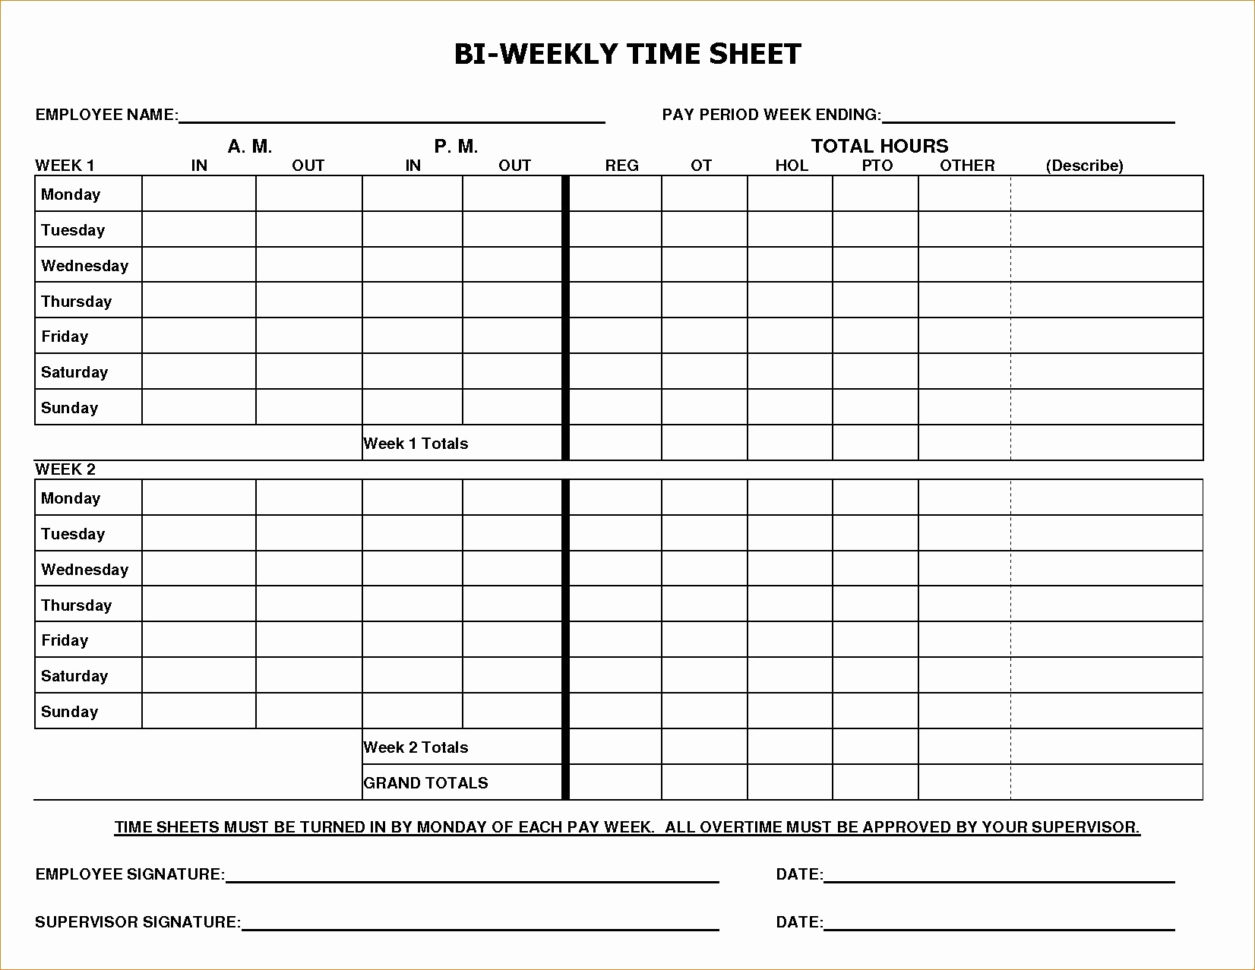 Timesheet Spreadsheet Formula Regarding Excel Timesheet Template With Formulas Beautiful Excel Timesheet